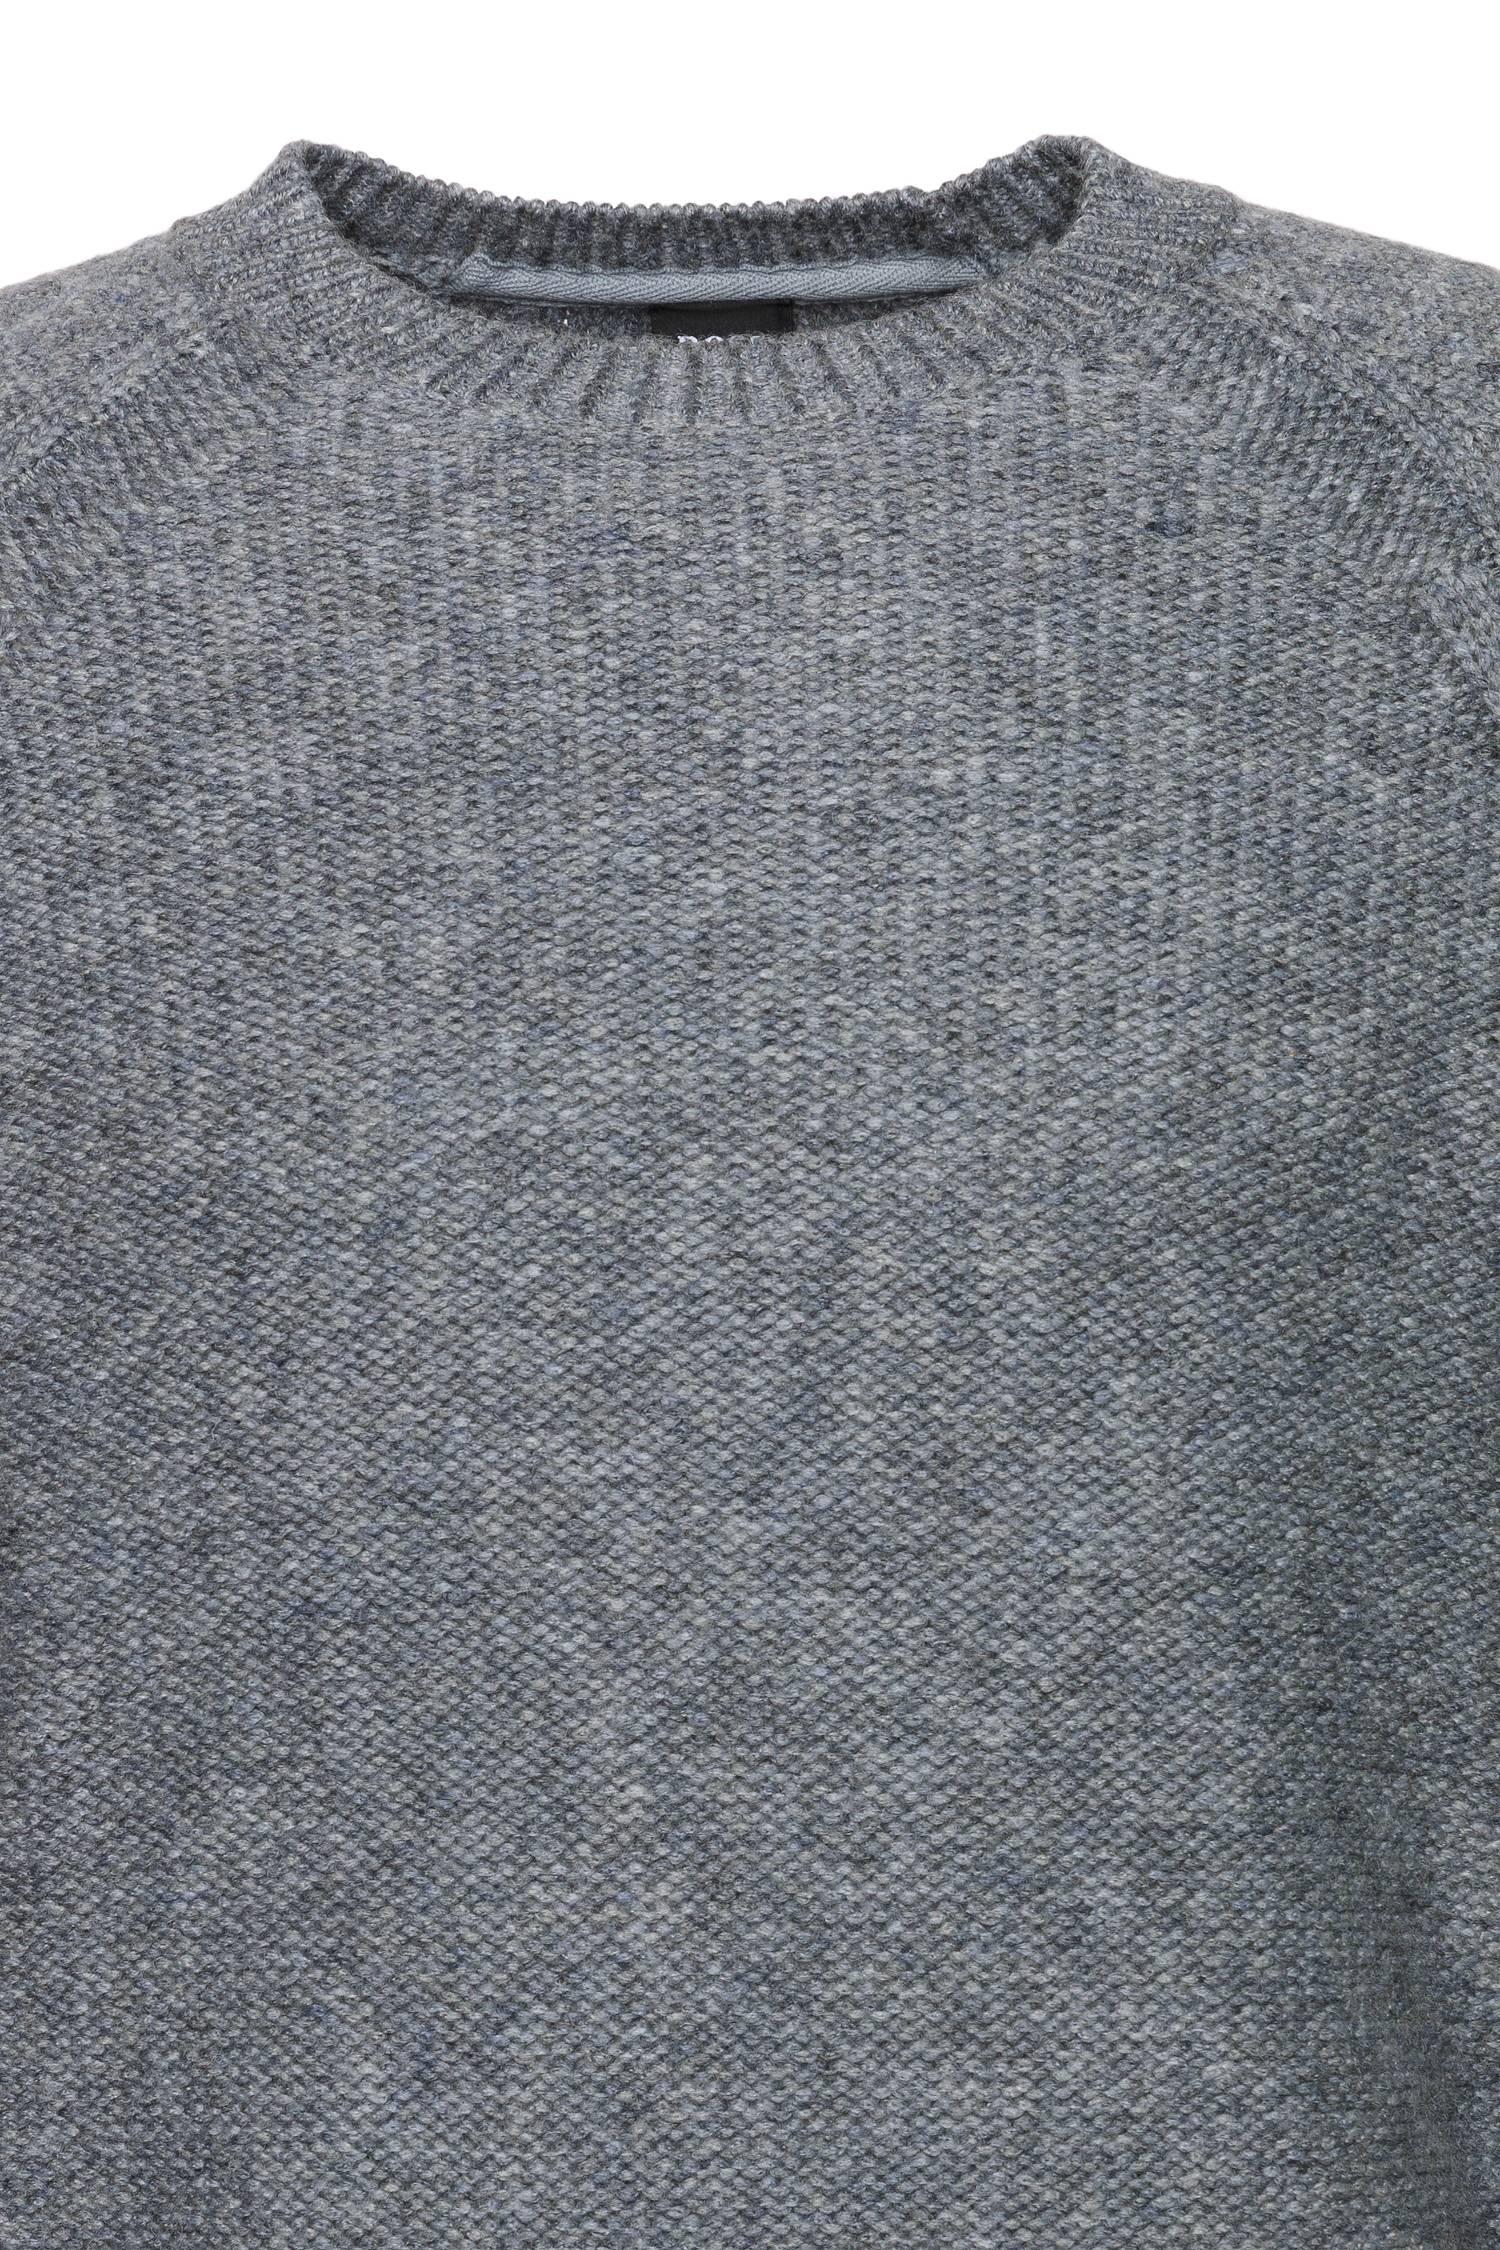 S.E.H KELLY Sweaters Sweaters Sweaters  836787 blu 70cec0